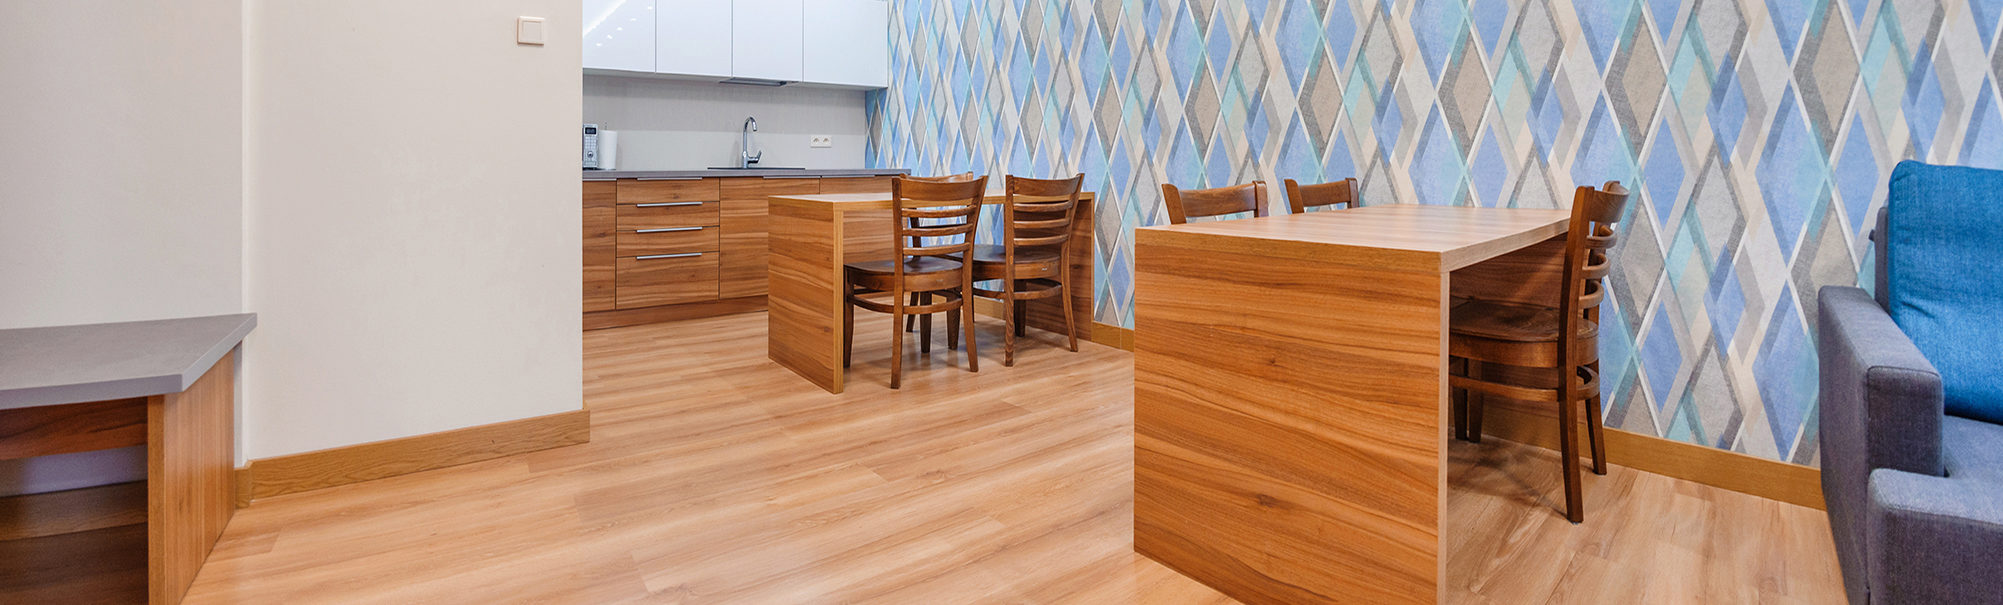 Apartamenty Sun&Snow Apartament A 32 Hel - Cypel Helski